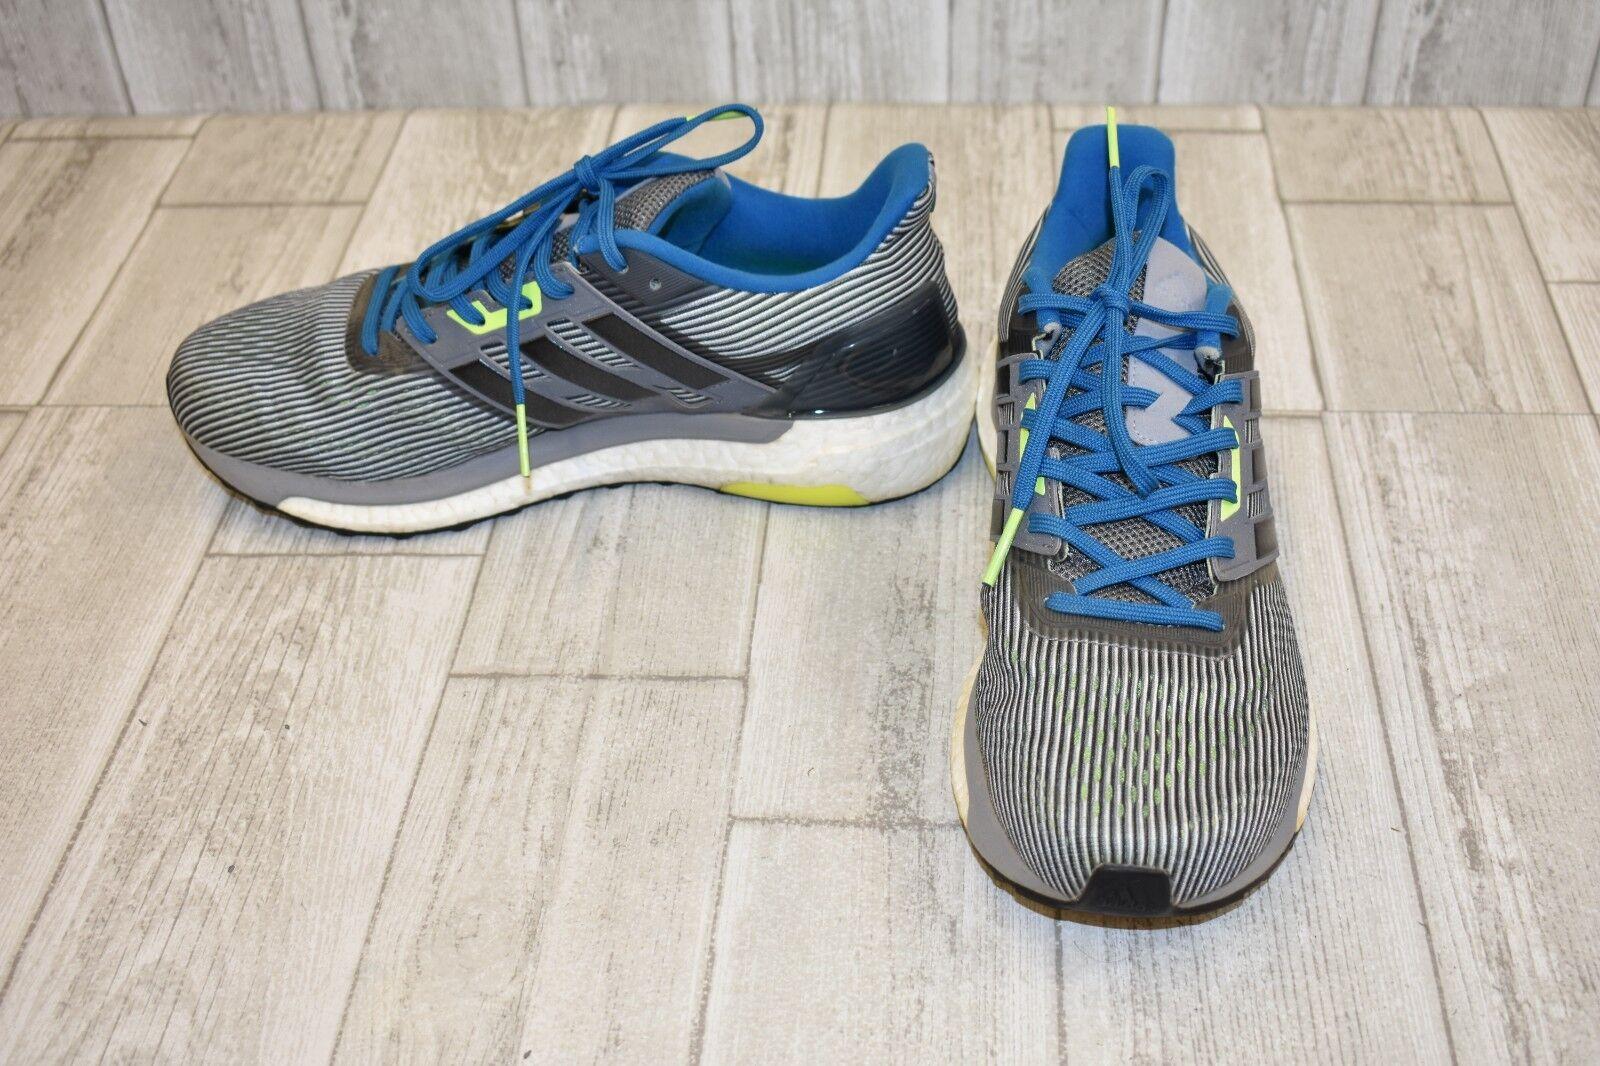 970692a0c0 Adidas Running Supernova Stability Sneaker Sneaker Sneaker - Men s Size 10  Gray Blue 764e2d